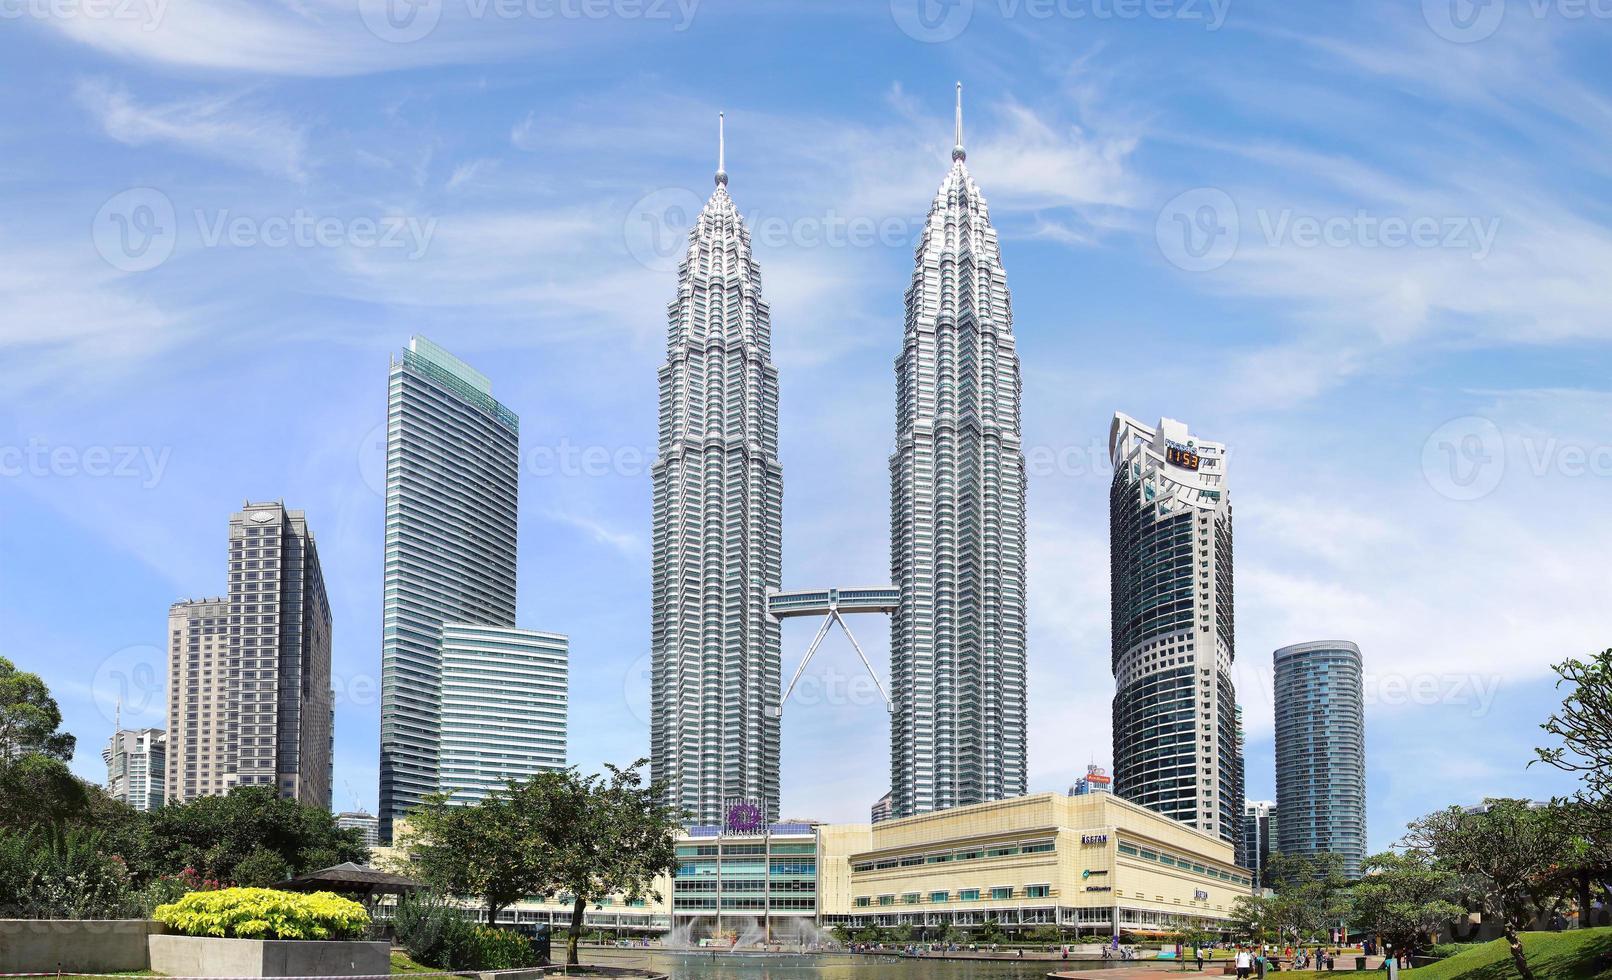 Petronas Twin Towers. Kuala Lumpur, Malaysia photo